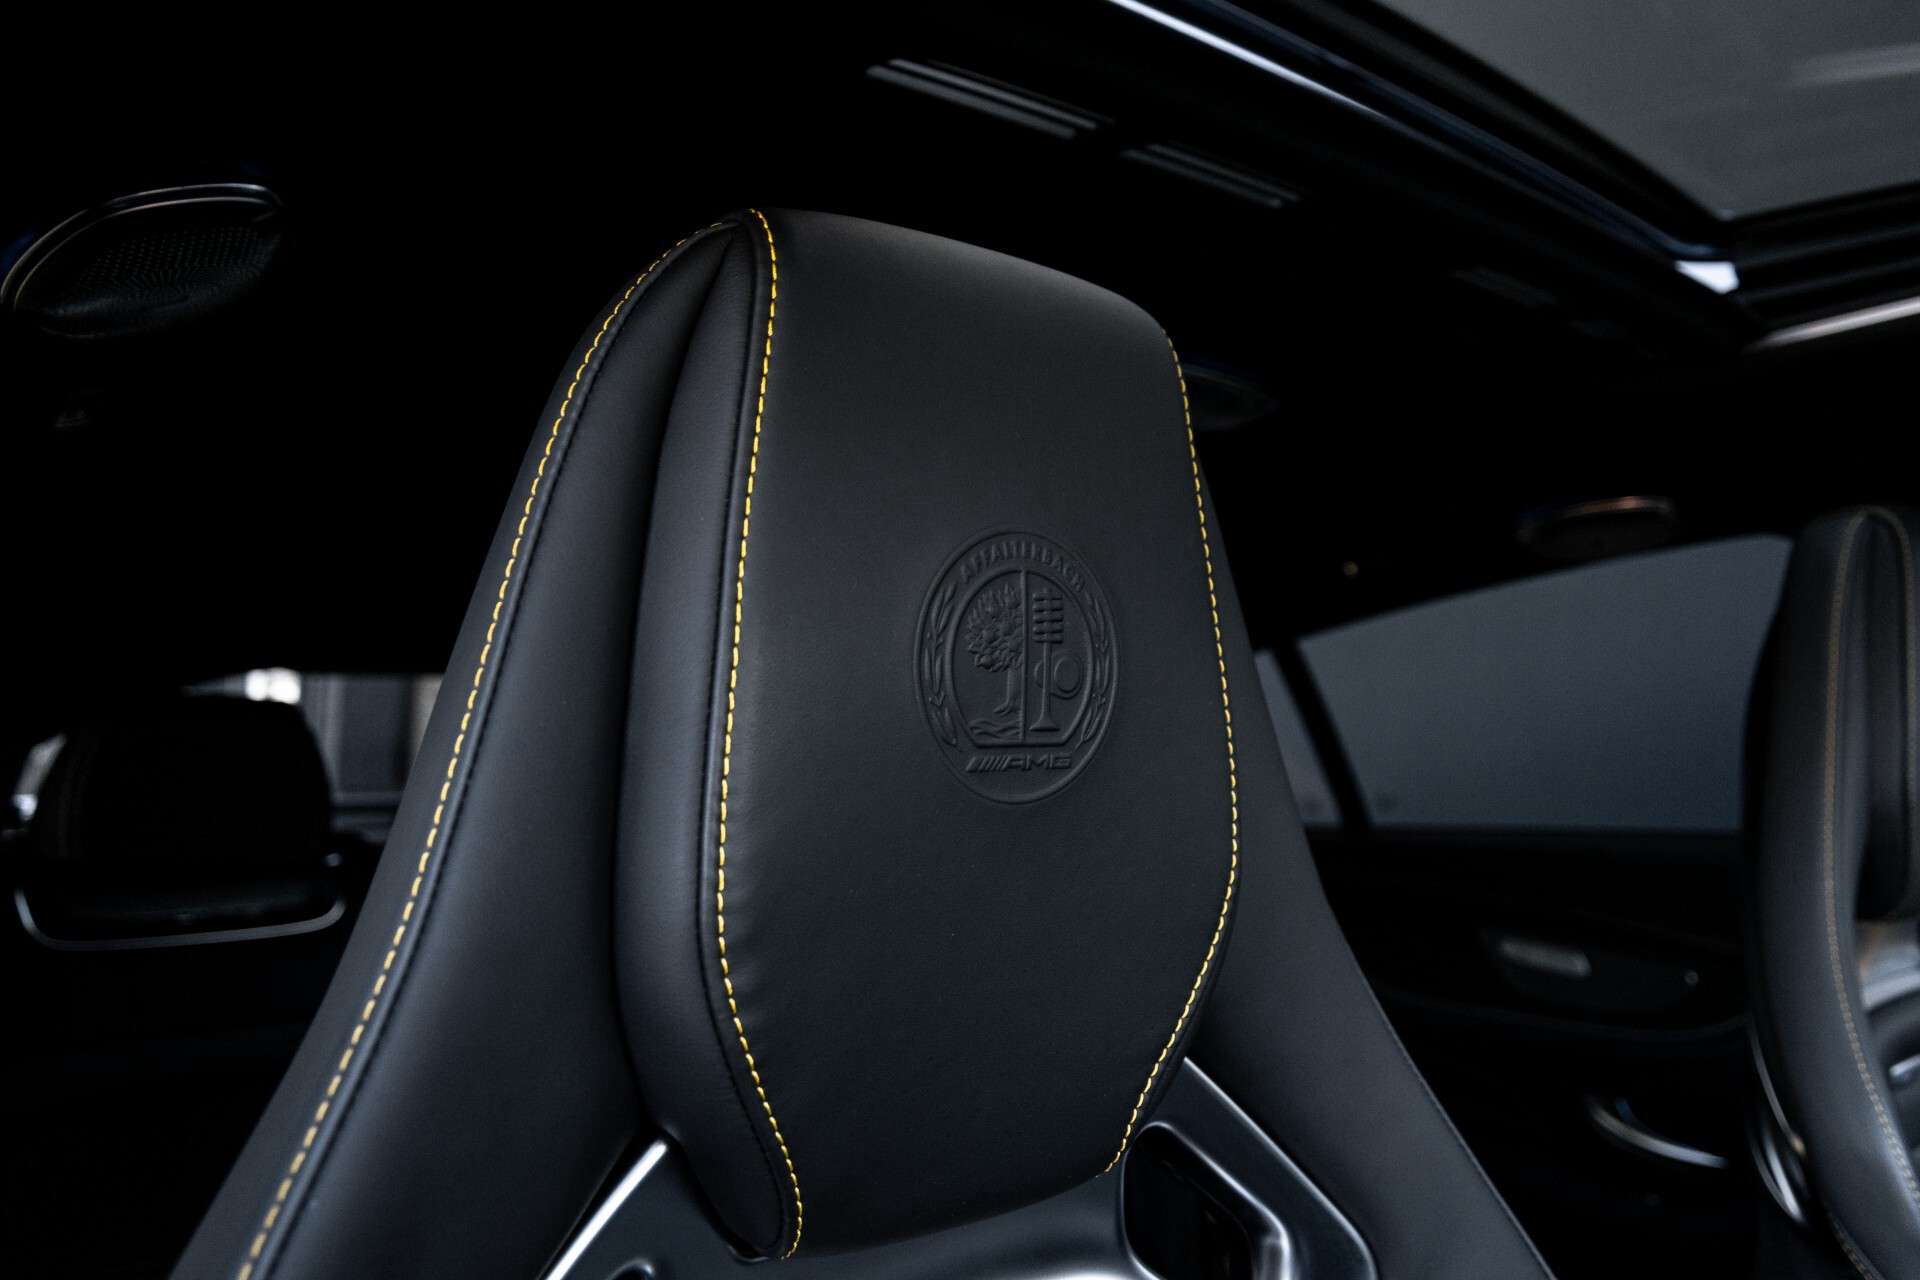 Mercedes-Benz AMG GT 4-Door Coupe 63 S 4MATIC+ Edition 1 Keramisch/Carbon/First Class/Dynamic Plus/Burmester High End 3D Aut9 Foto 68